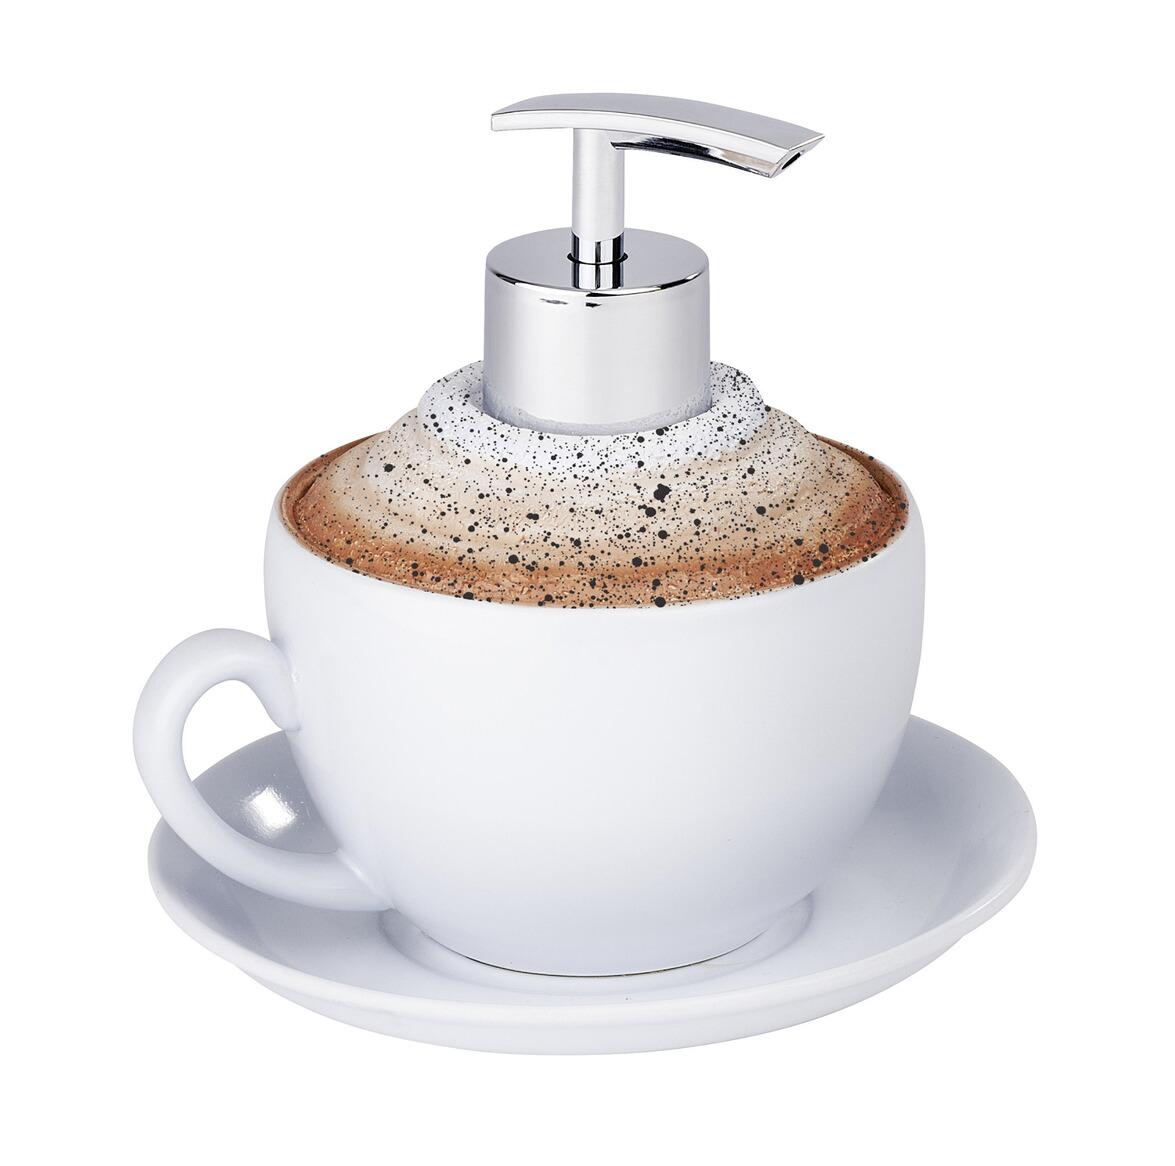 Seifenspender Cappuccino Spülmittelspender